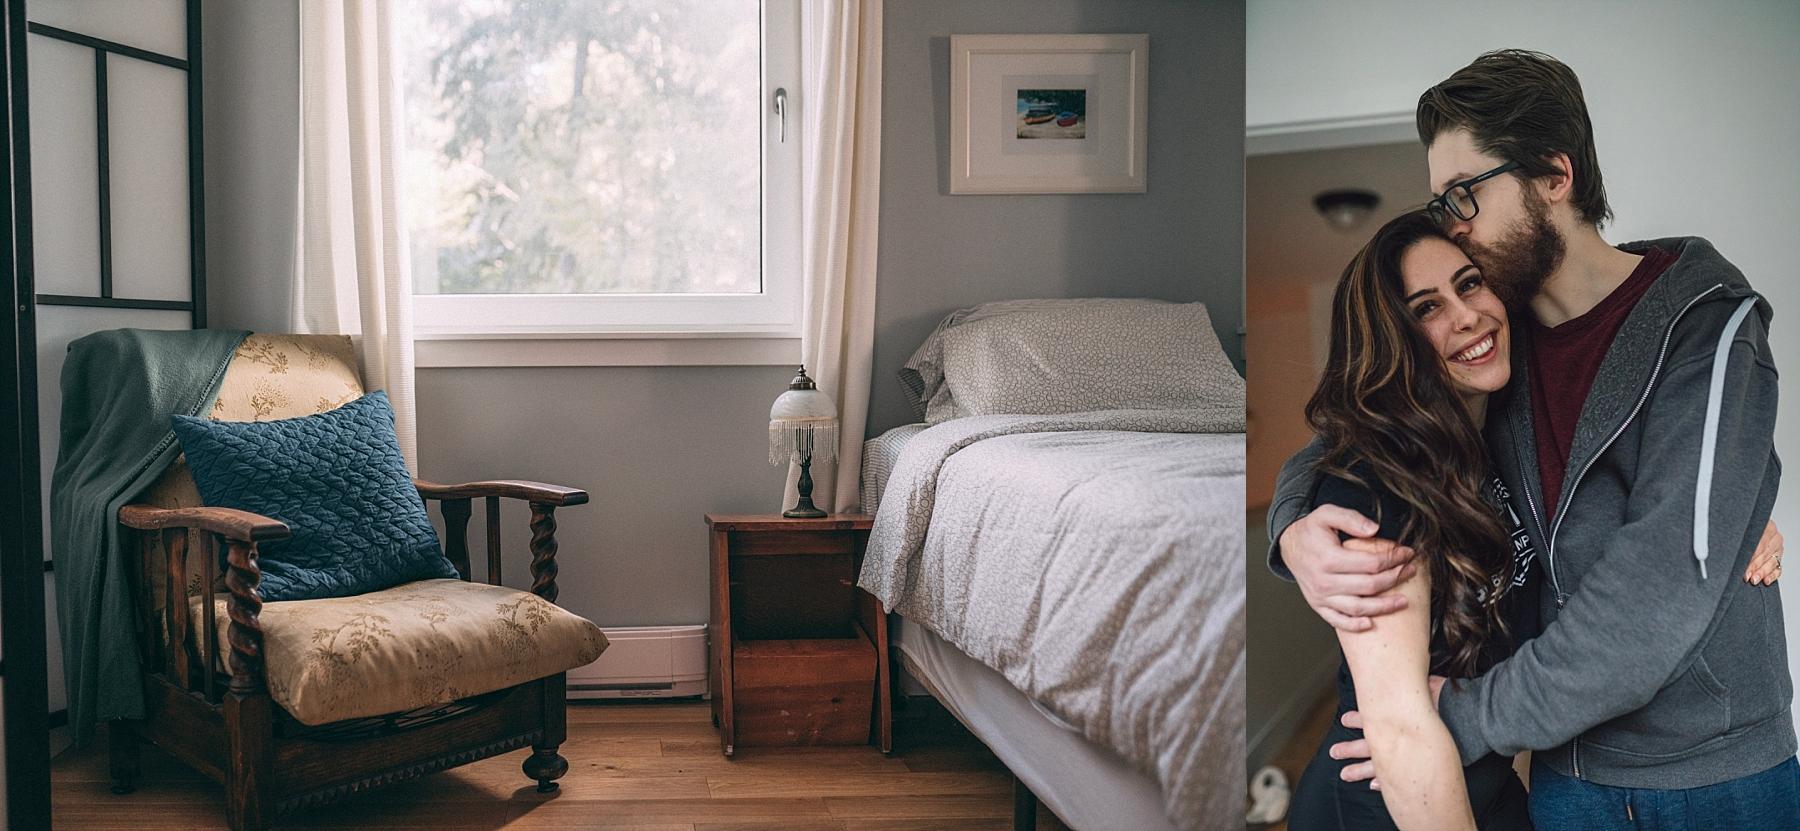 galiano island airbnb